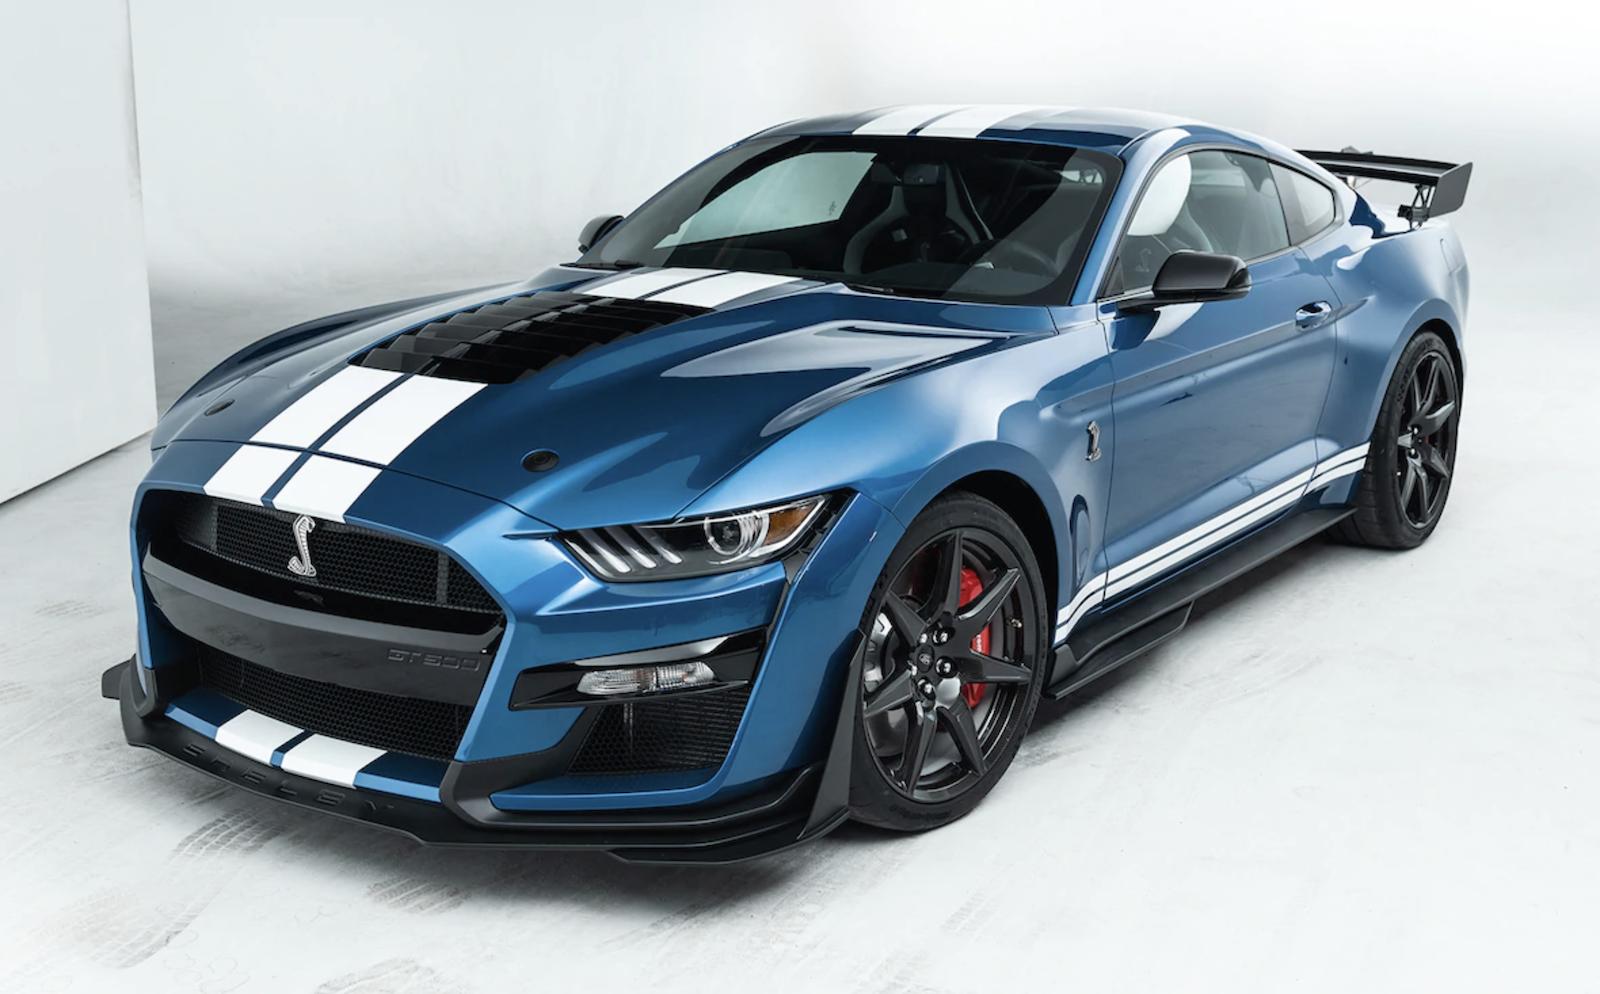 2020 Ford Mustang Cobra Gt